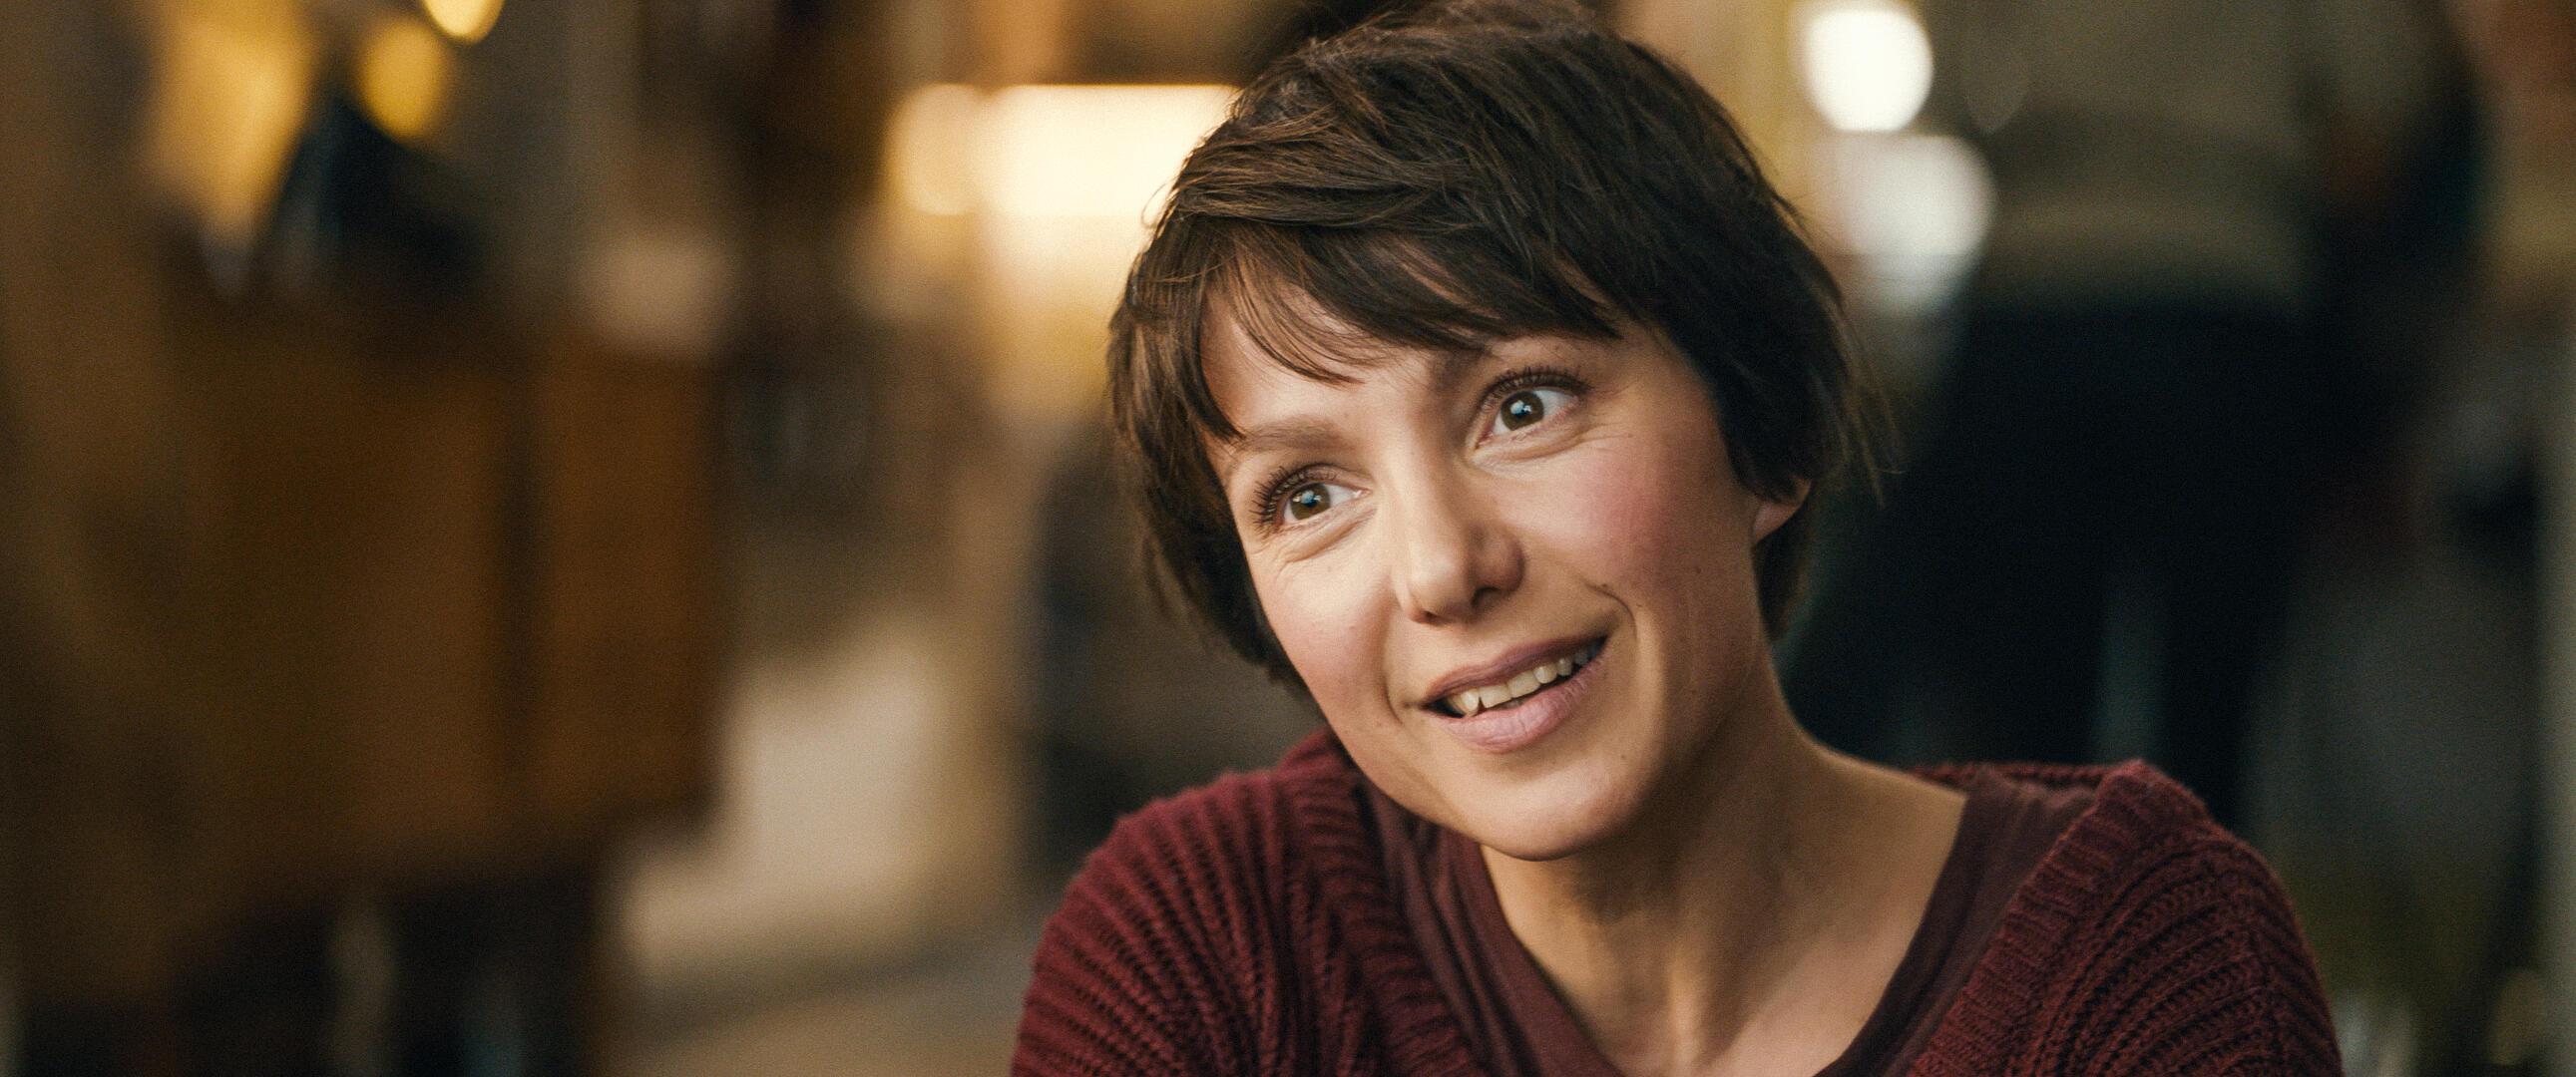 Julia Koschitz Filme